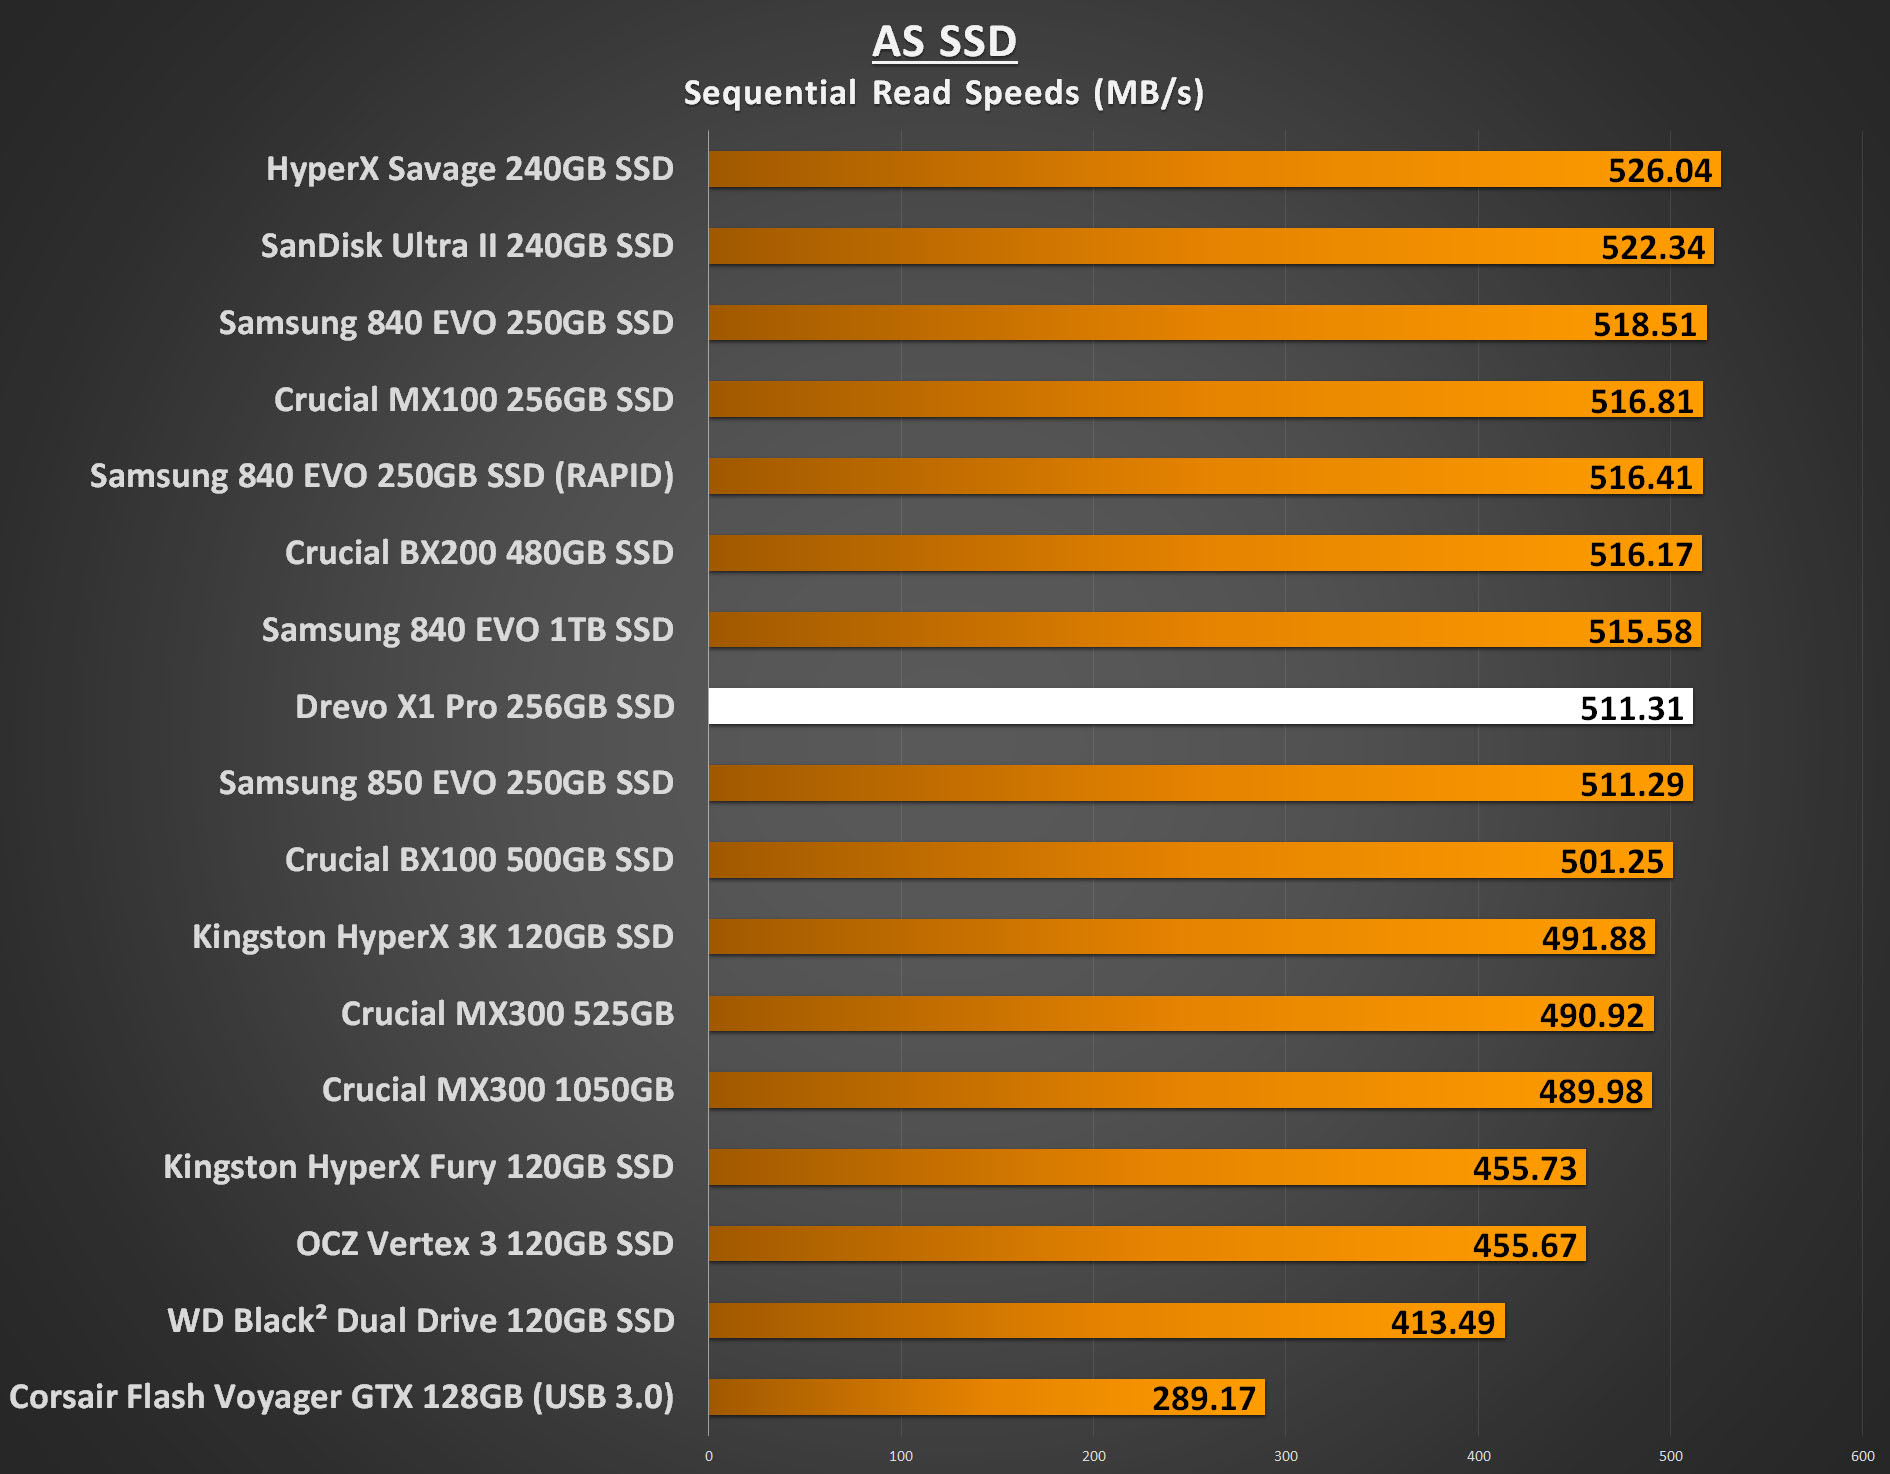 Drevo X1 Pro 256GB Performance - AS SSD Seq Read